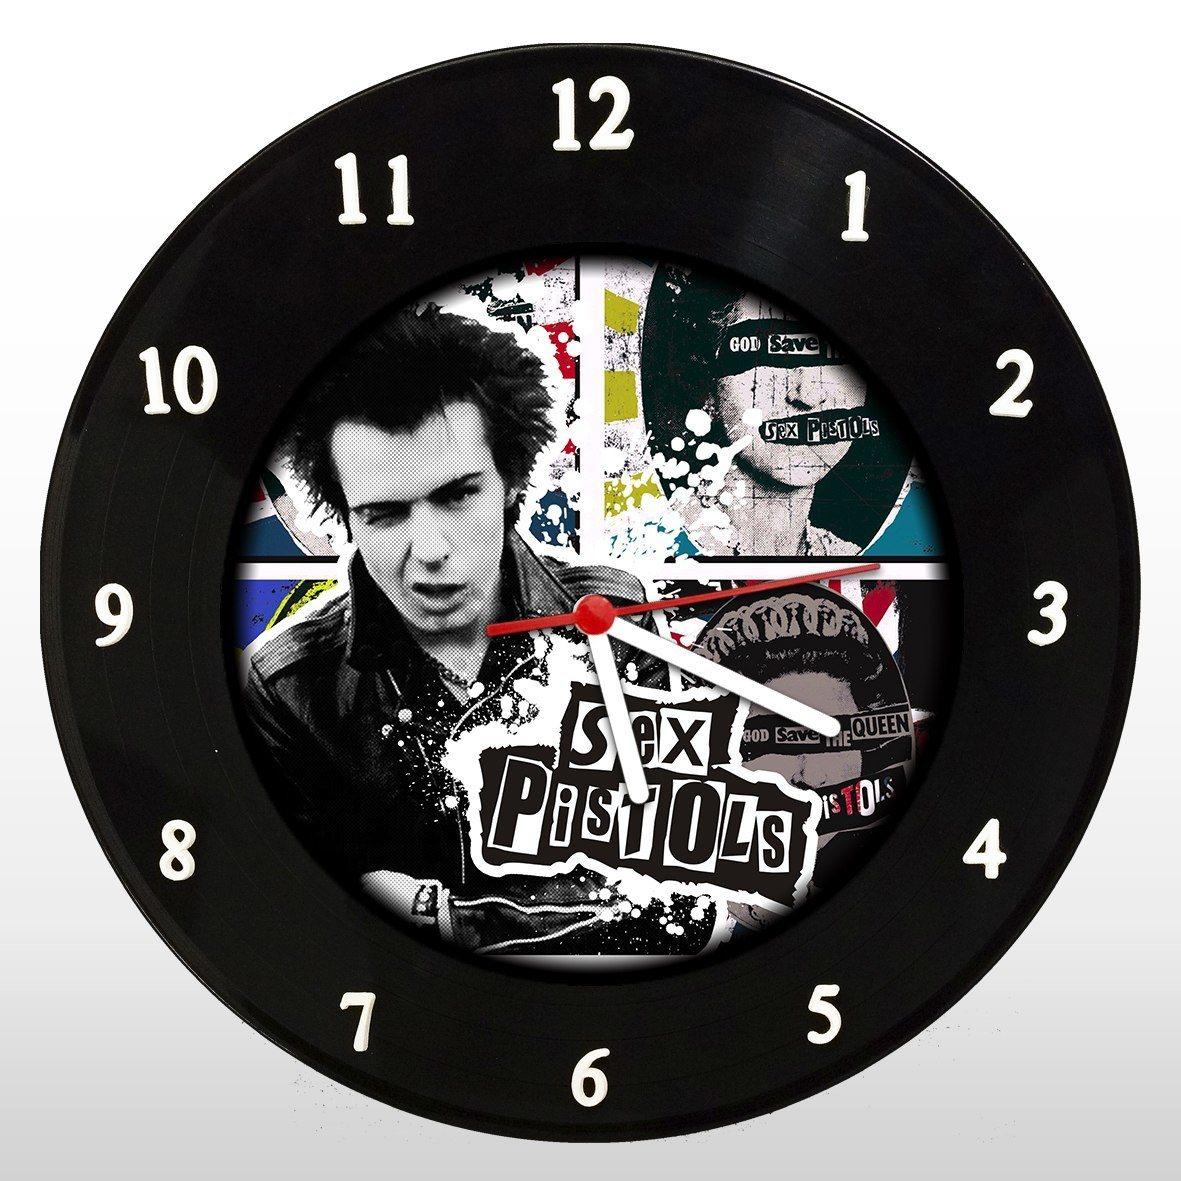 Sex Pistols - Relógio de Parede em Disco de Vinil - Mr. Rock